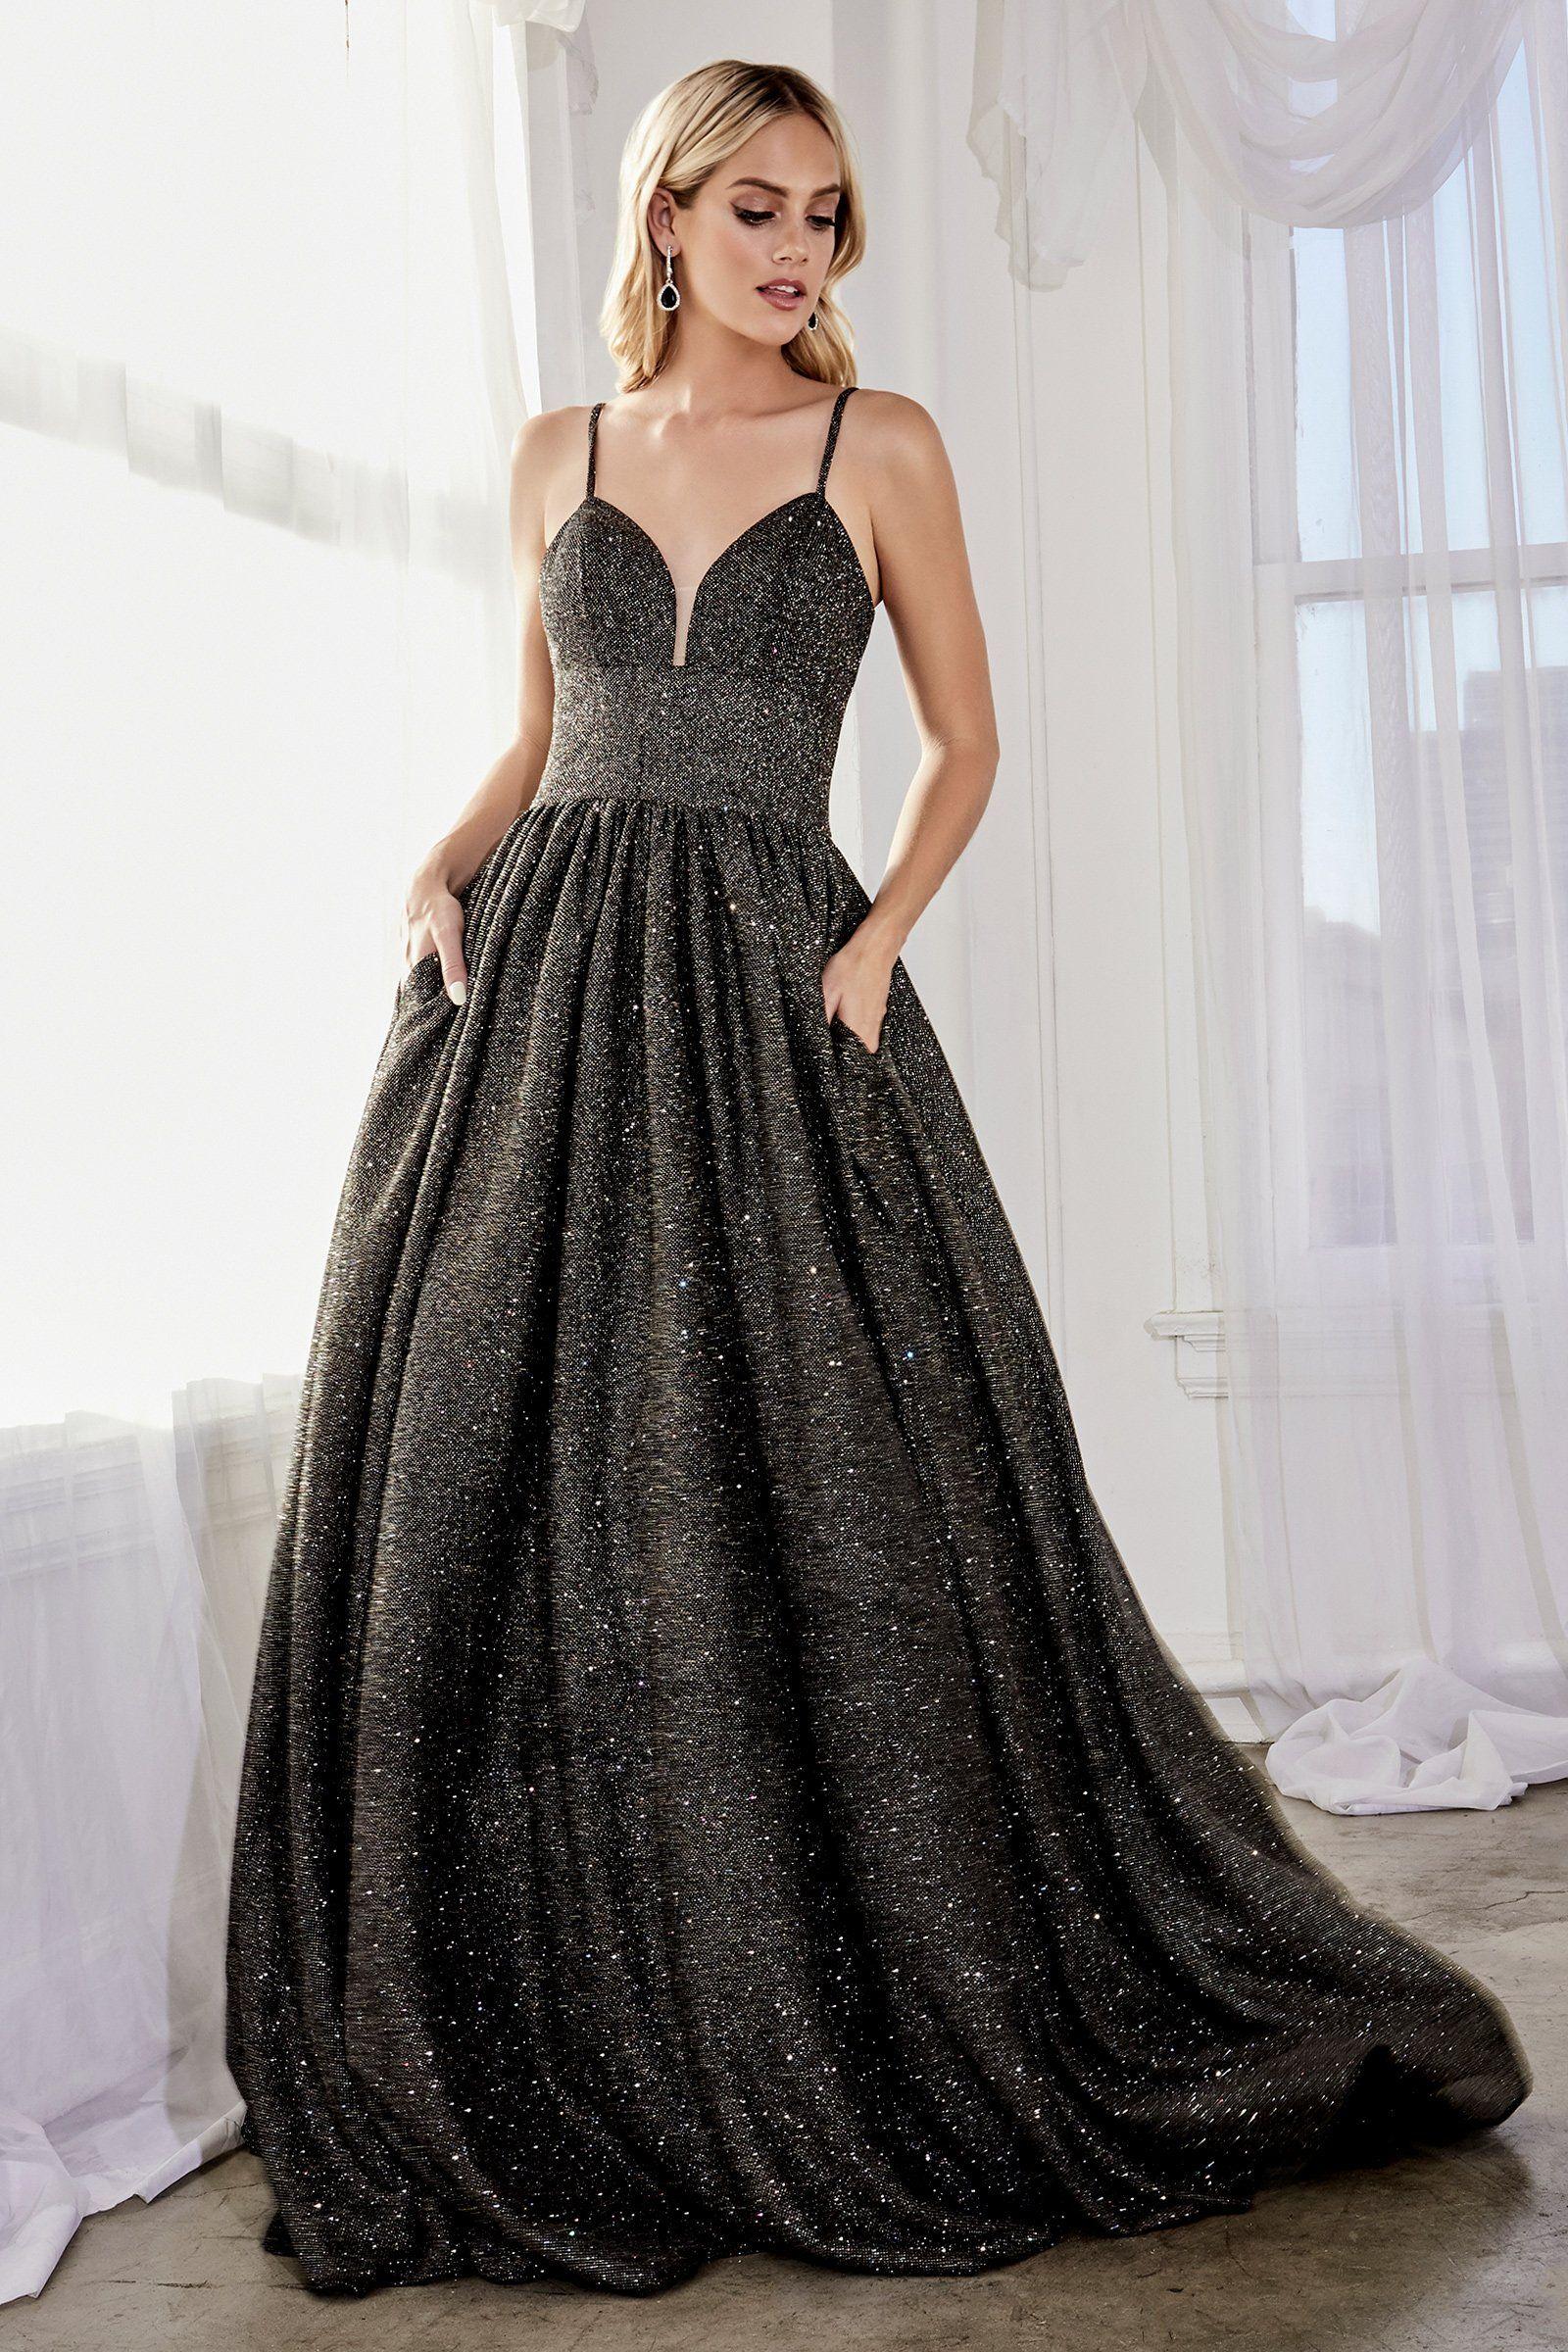 Cinderella Divine J796 Glitter Knit Sleeveless Corset Back Ballgown In 2021 Glitter Dress Ball Gowns Grey Prom Dress [ 2400 x 1600 Pixel ]